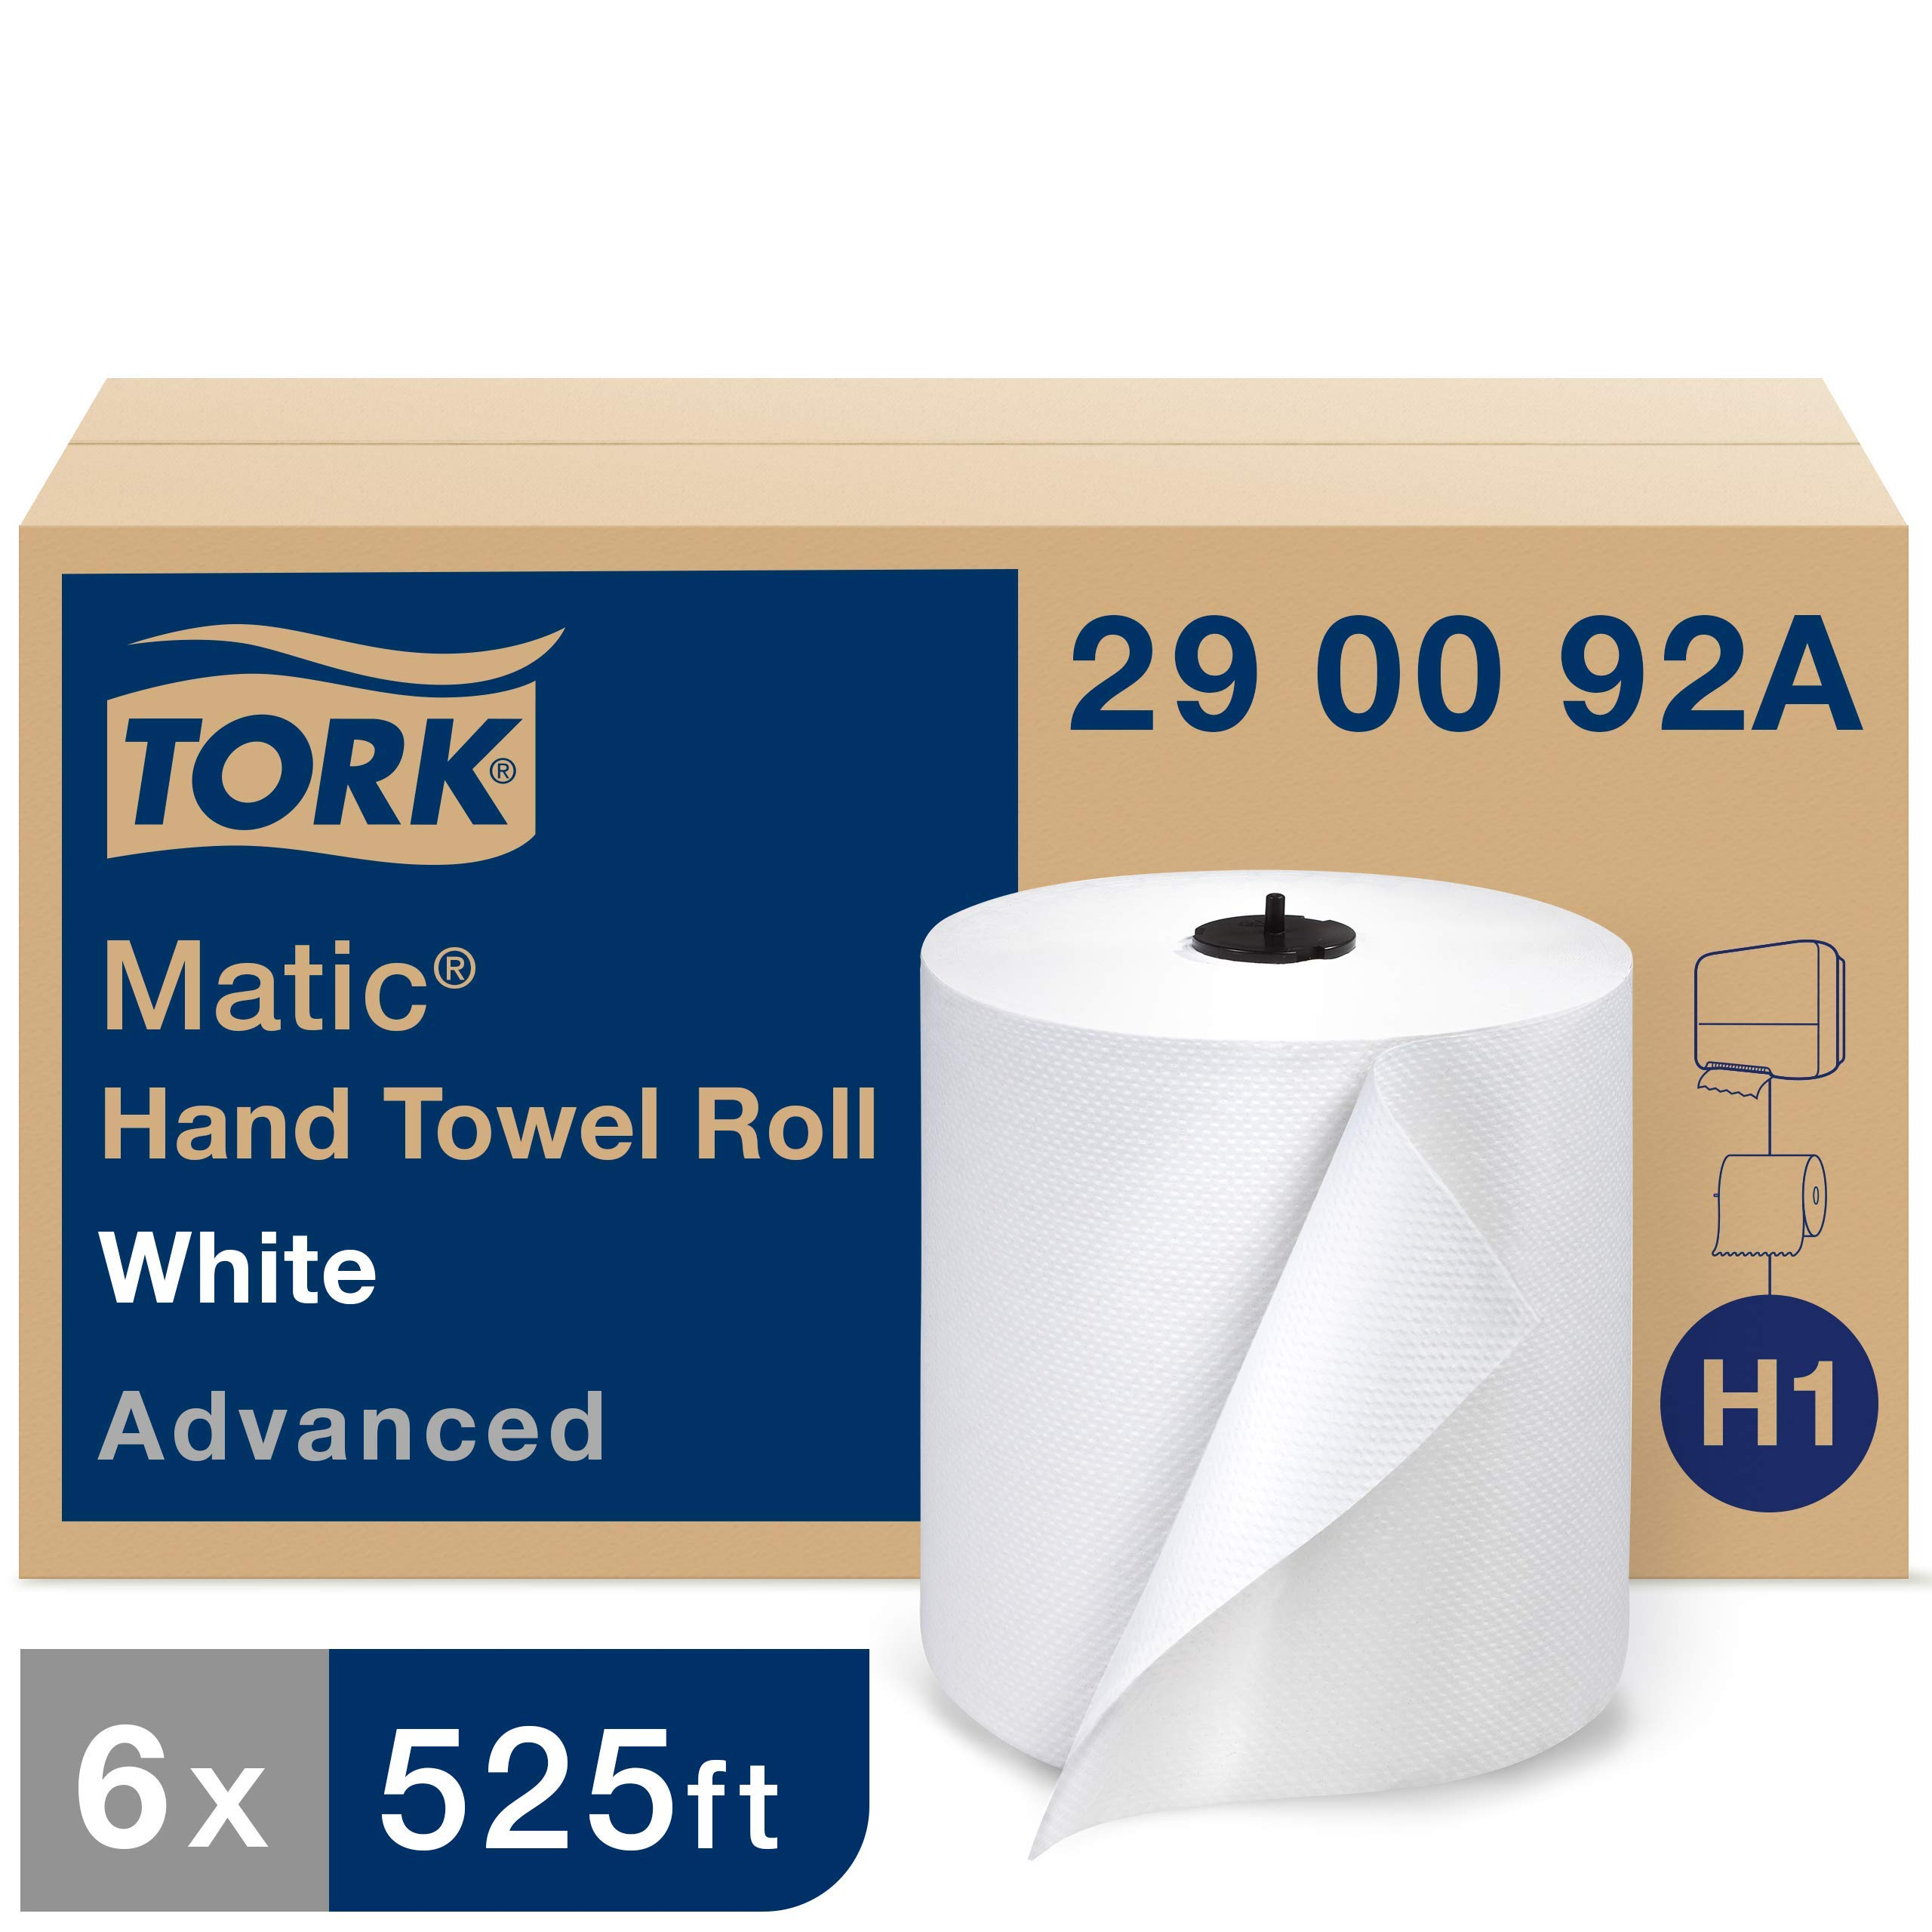 Tork 290092A Advanced Matic Paper Hand Towel Roll, 2-Ply, 7.7'' Width x 525' Length, White, (Case of 6 Rolls, 525 Feet per Roll, 3,150 Feet) by Tork